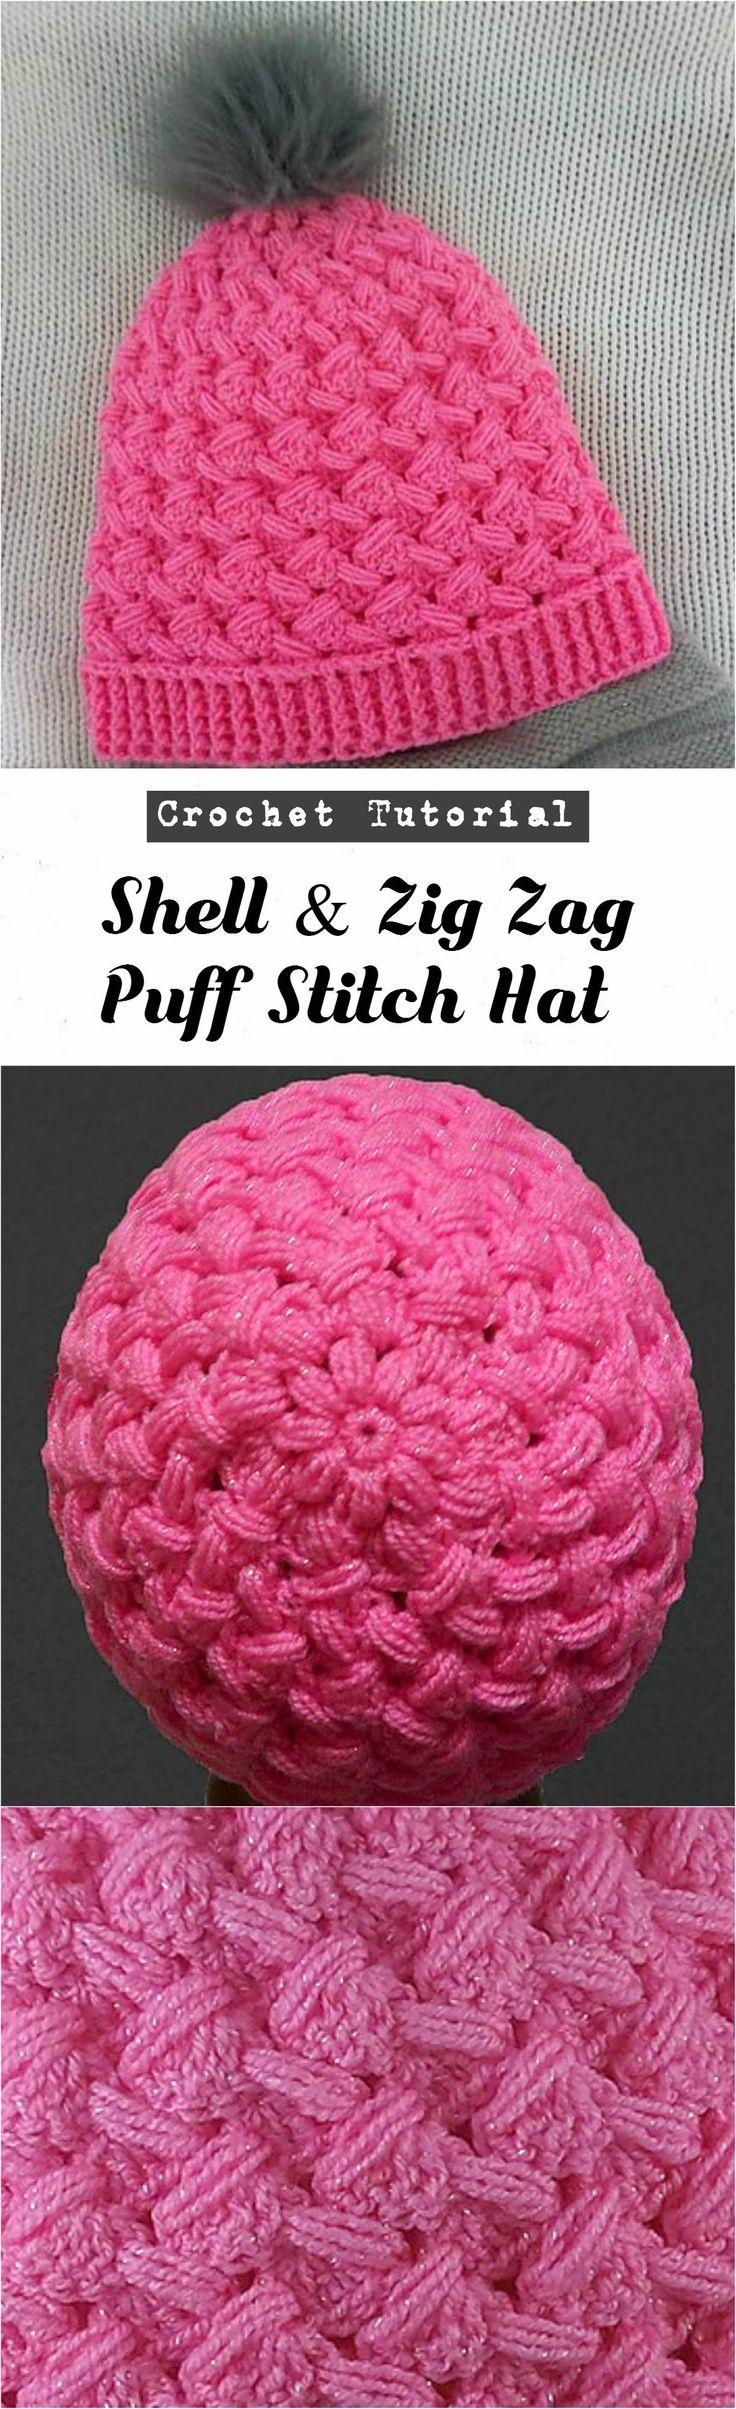 Crochet Shell & Zig Zag Puff Stitch Hat